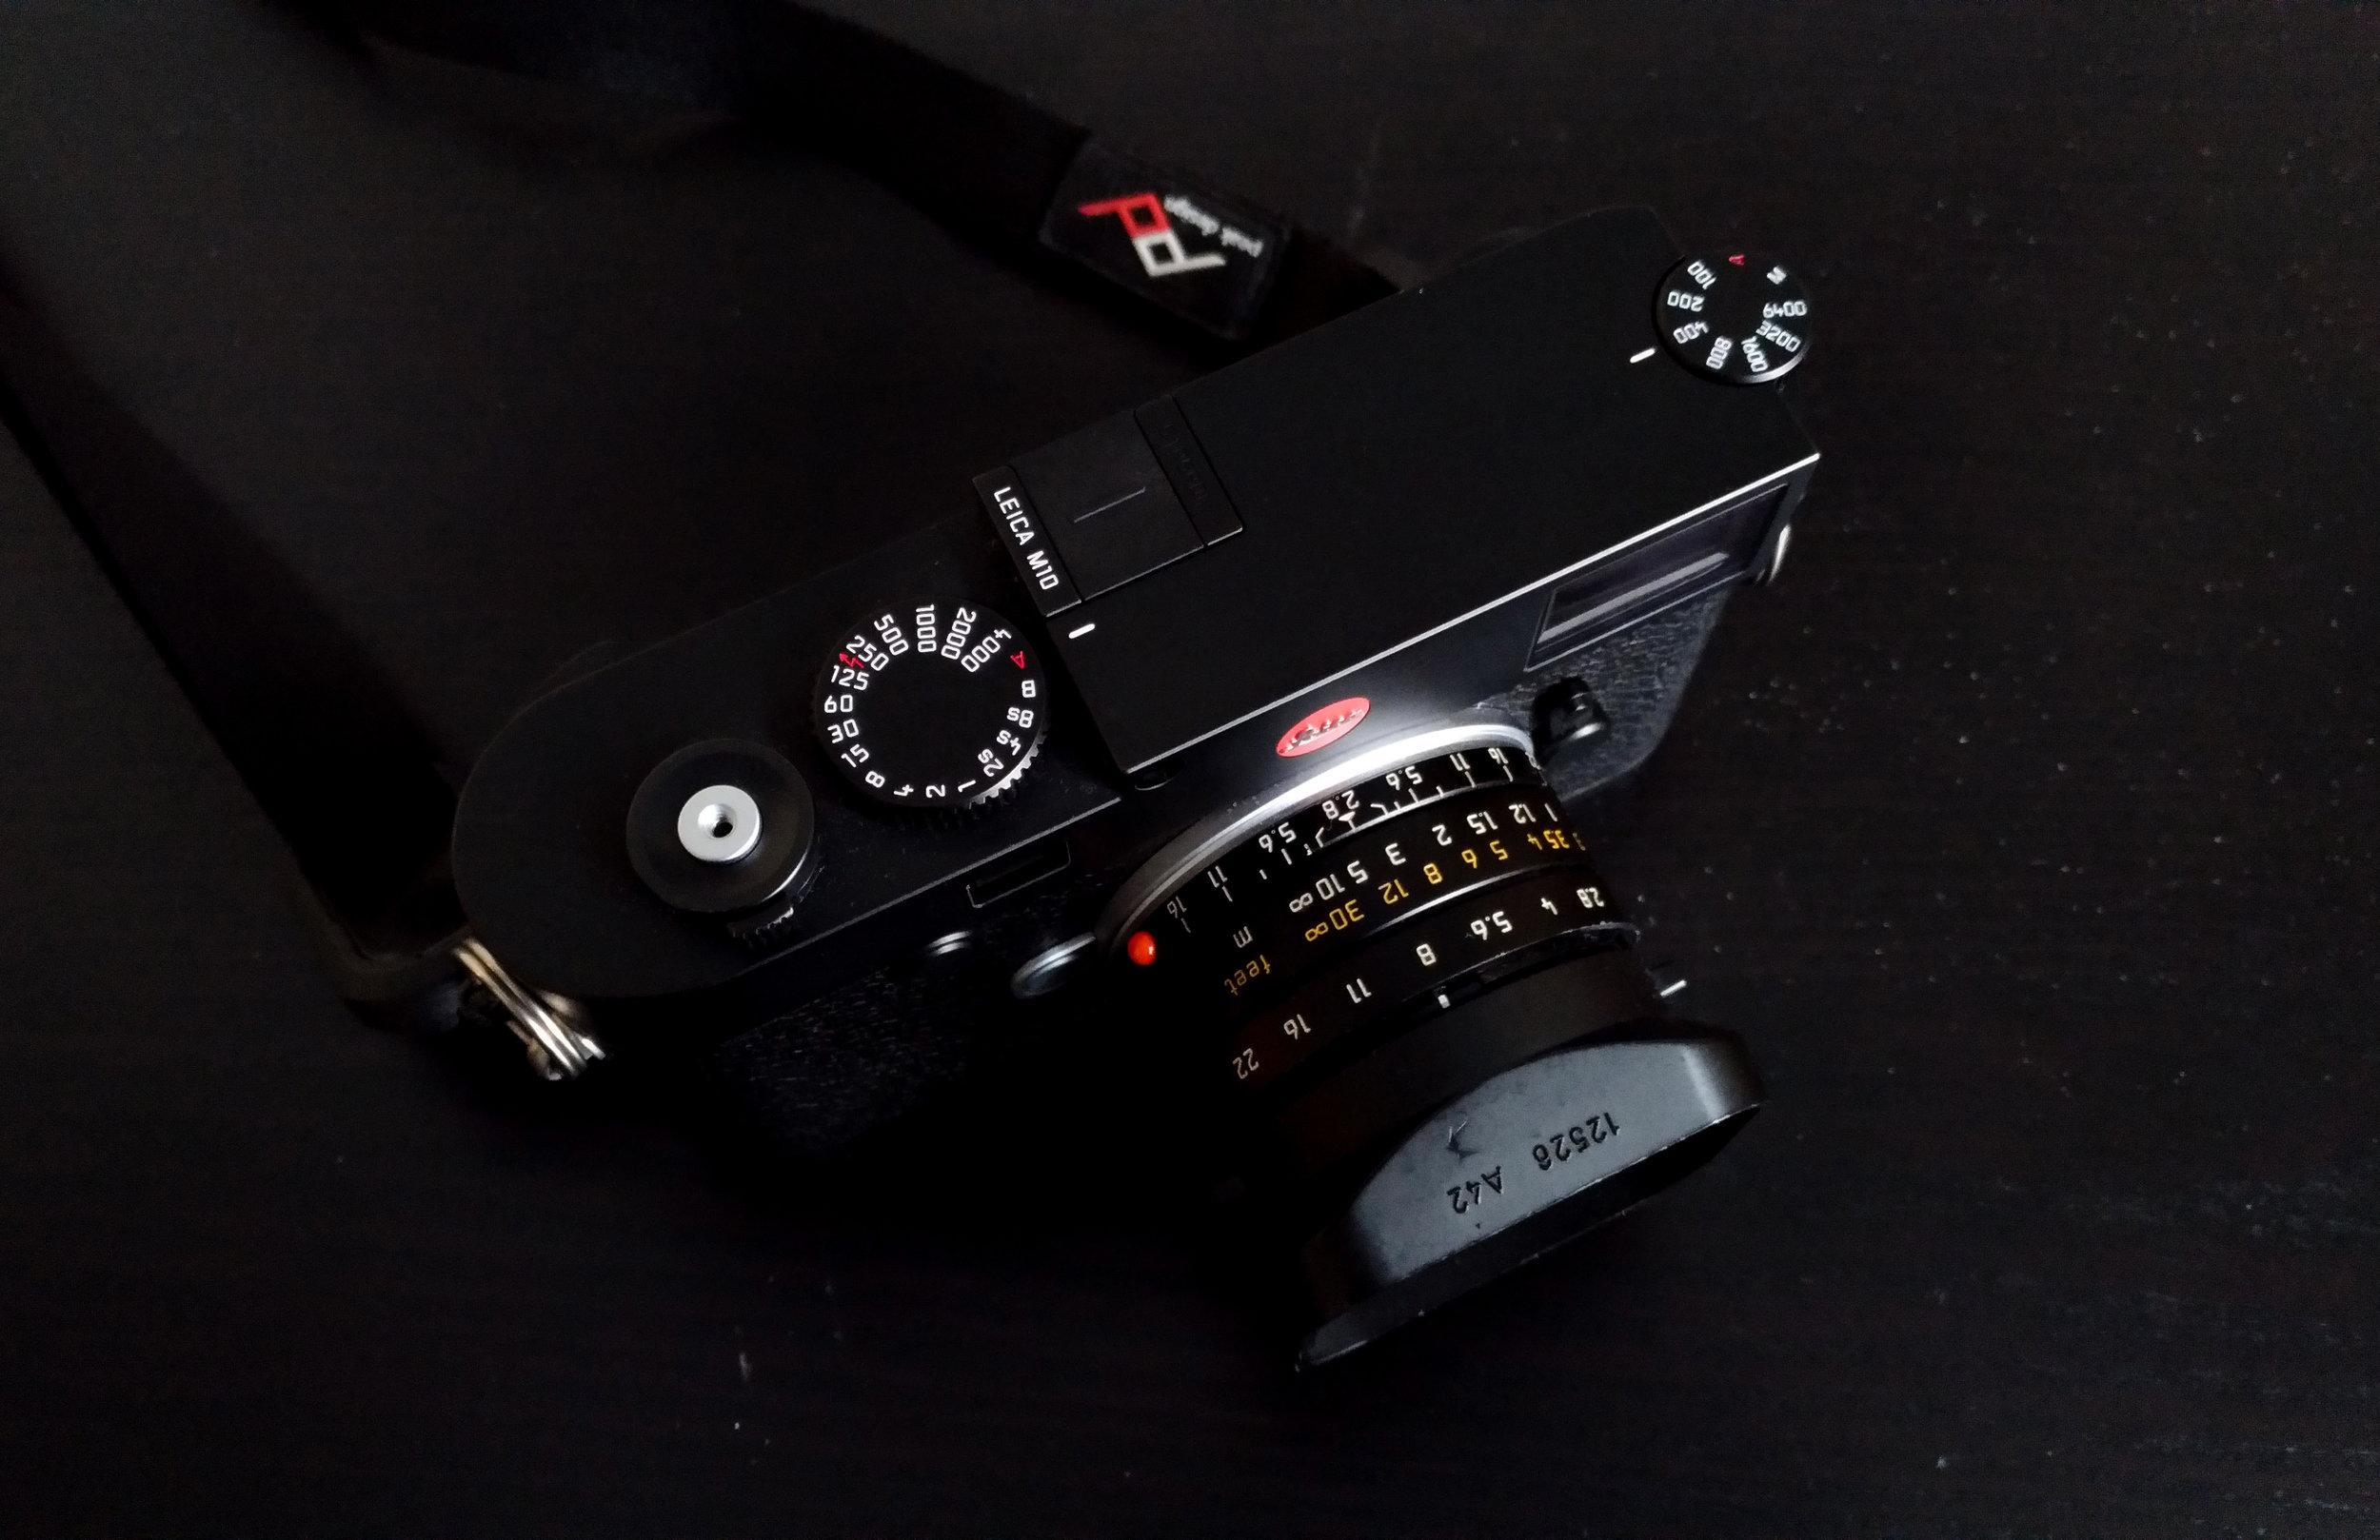 My Leica M10 WITH 28MM SUMMARIT